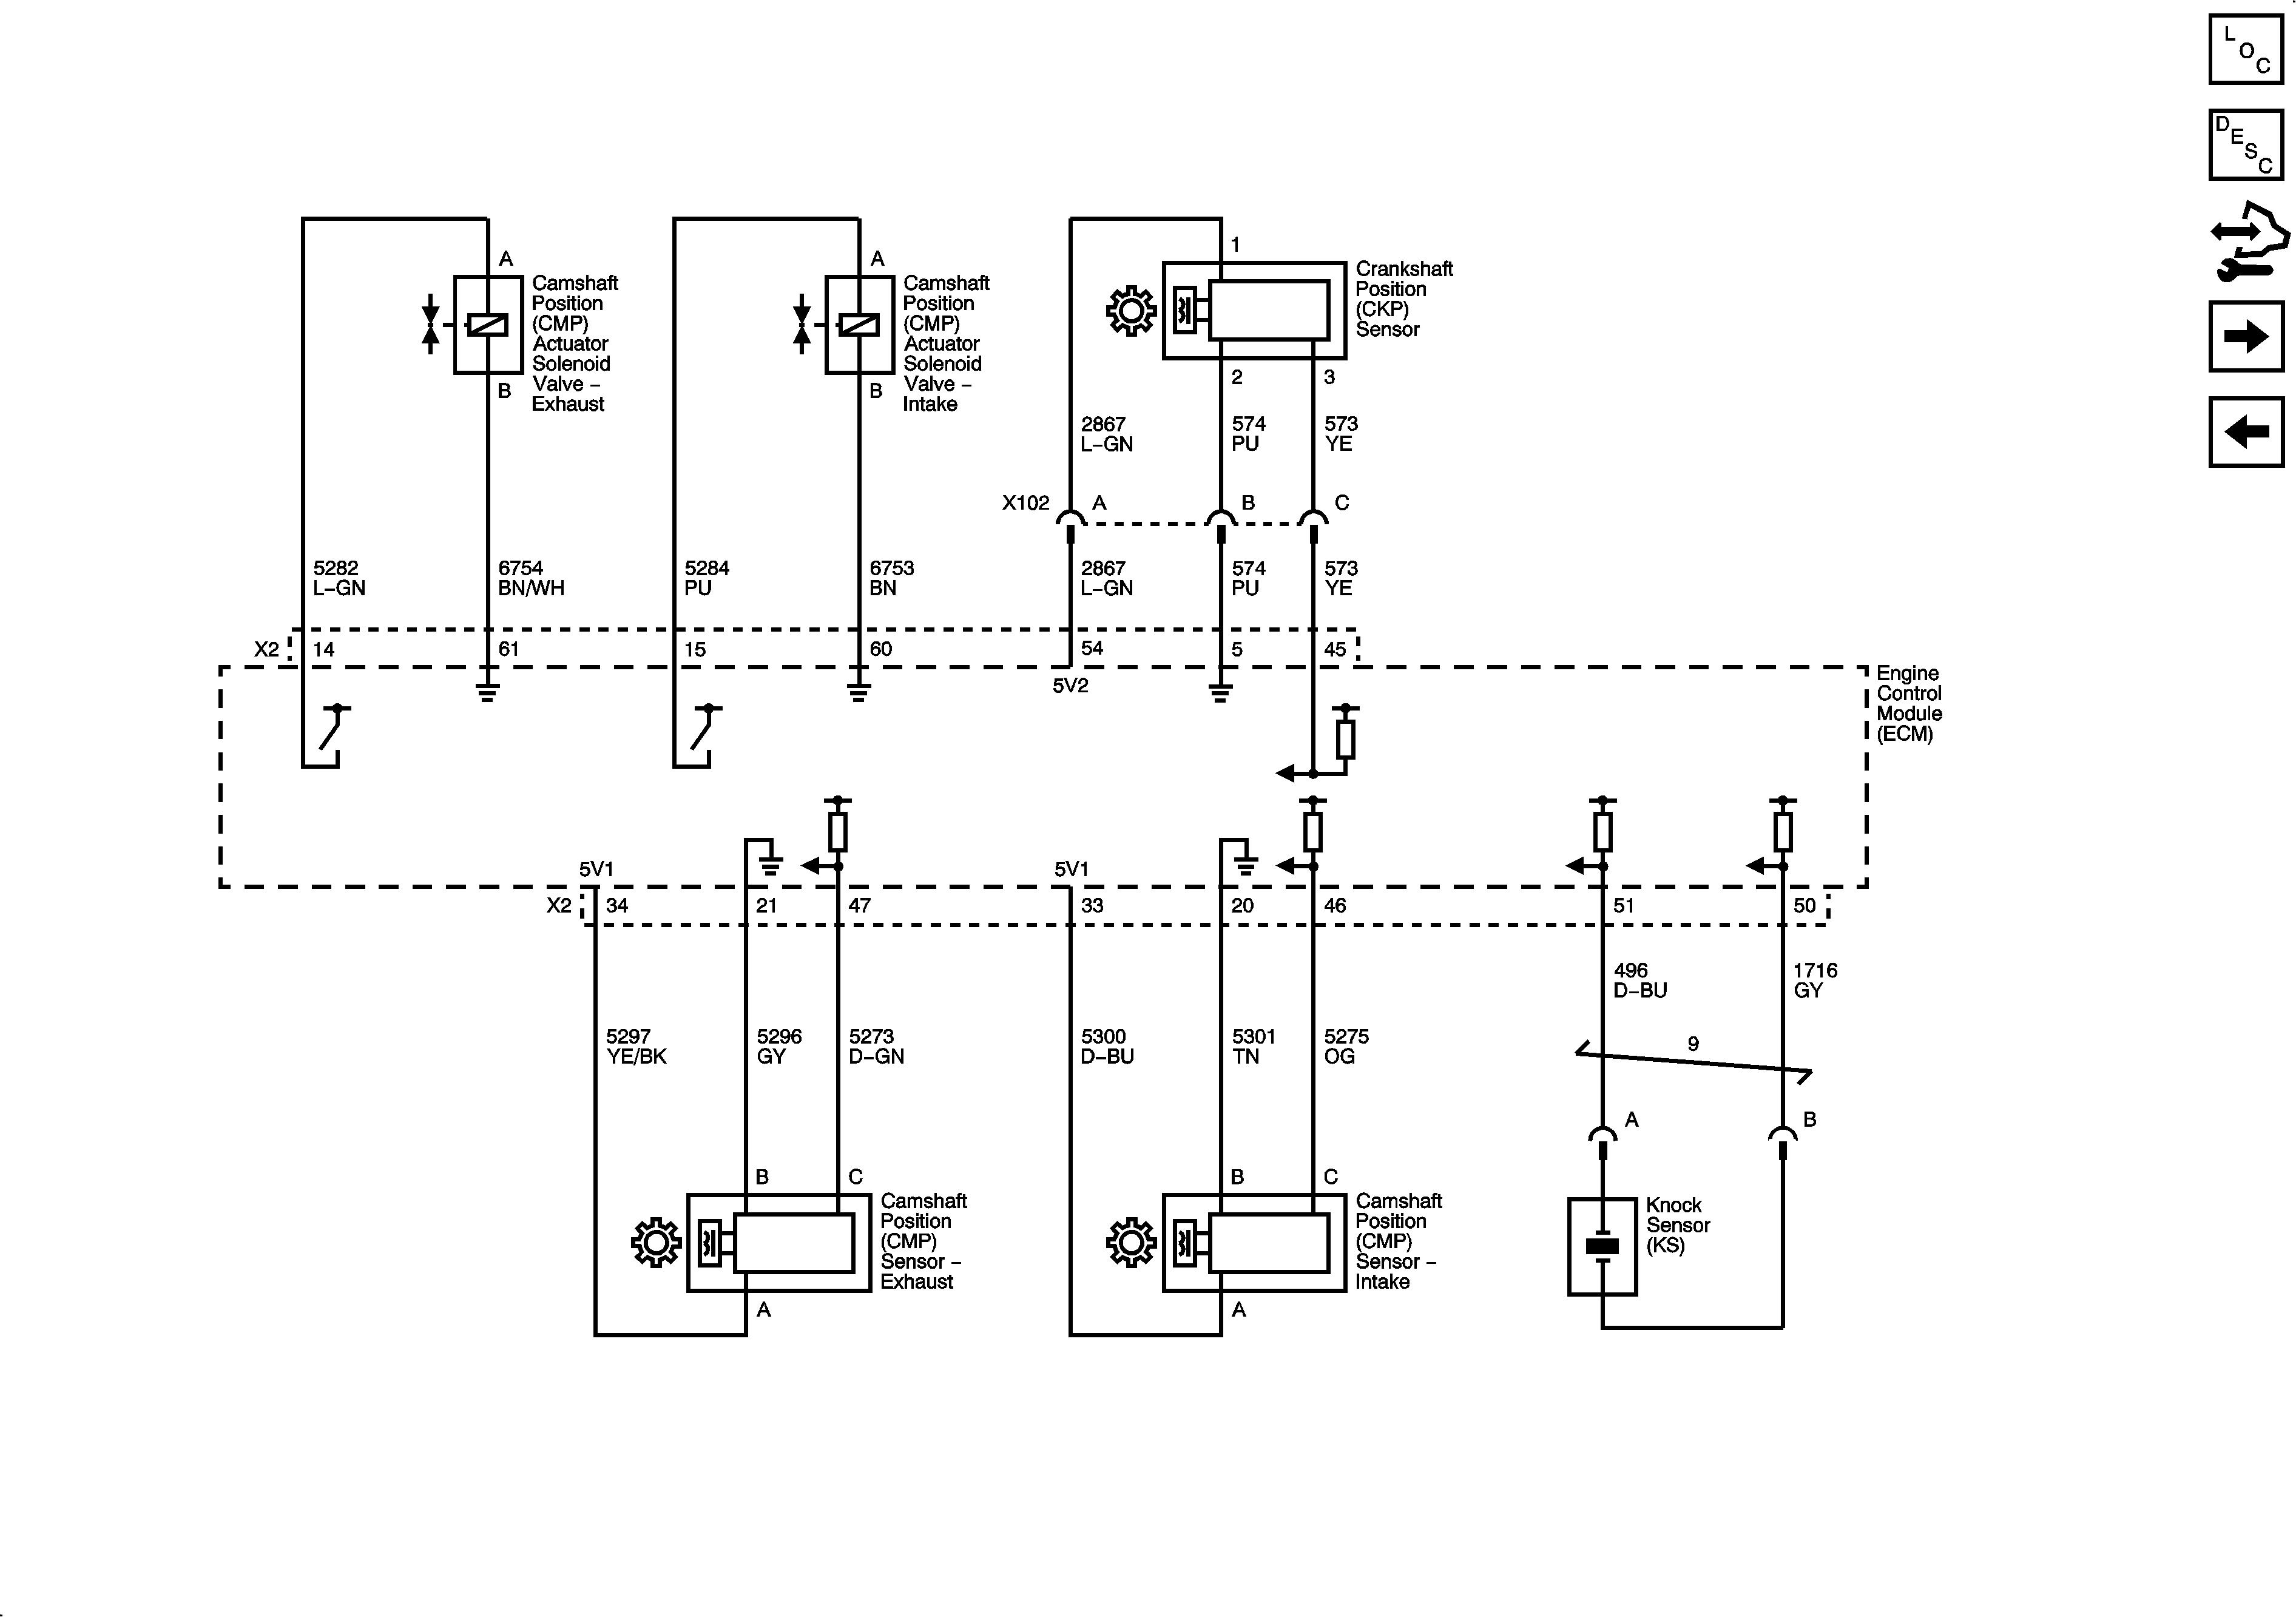 2008 pontiac g5 wire harness - honda pilot fuse diagram -  rc85wirings.tukune.jeanjaures37.fr  wiring diagram resource